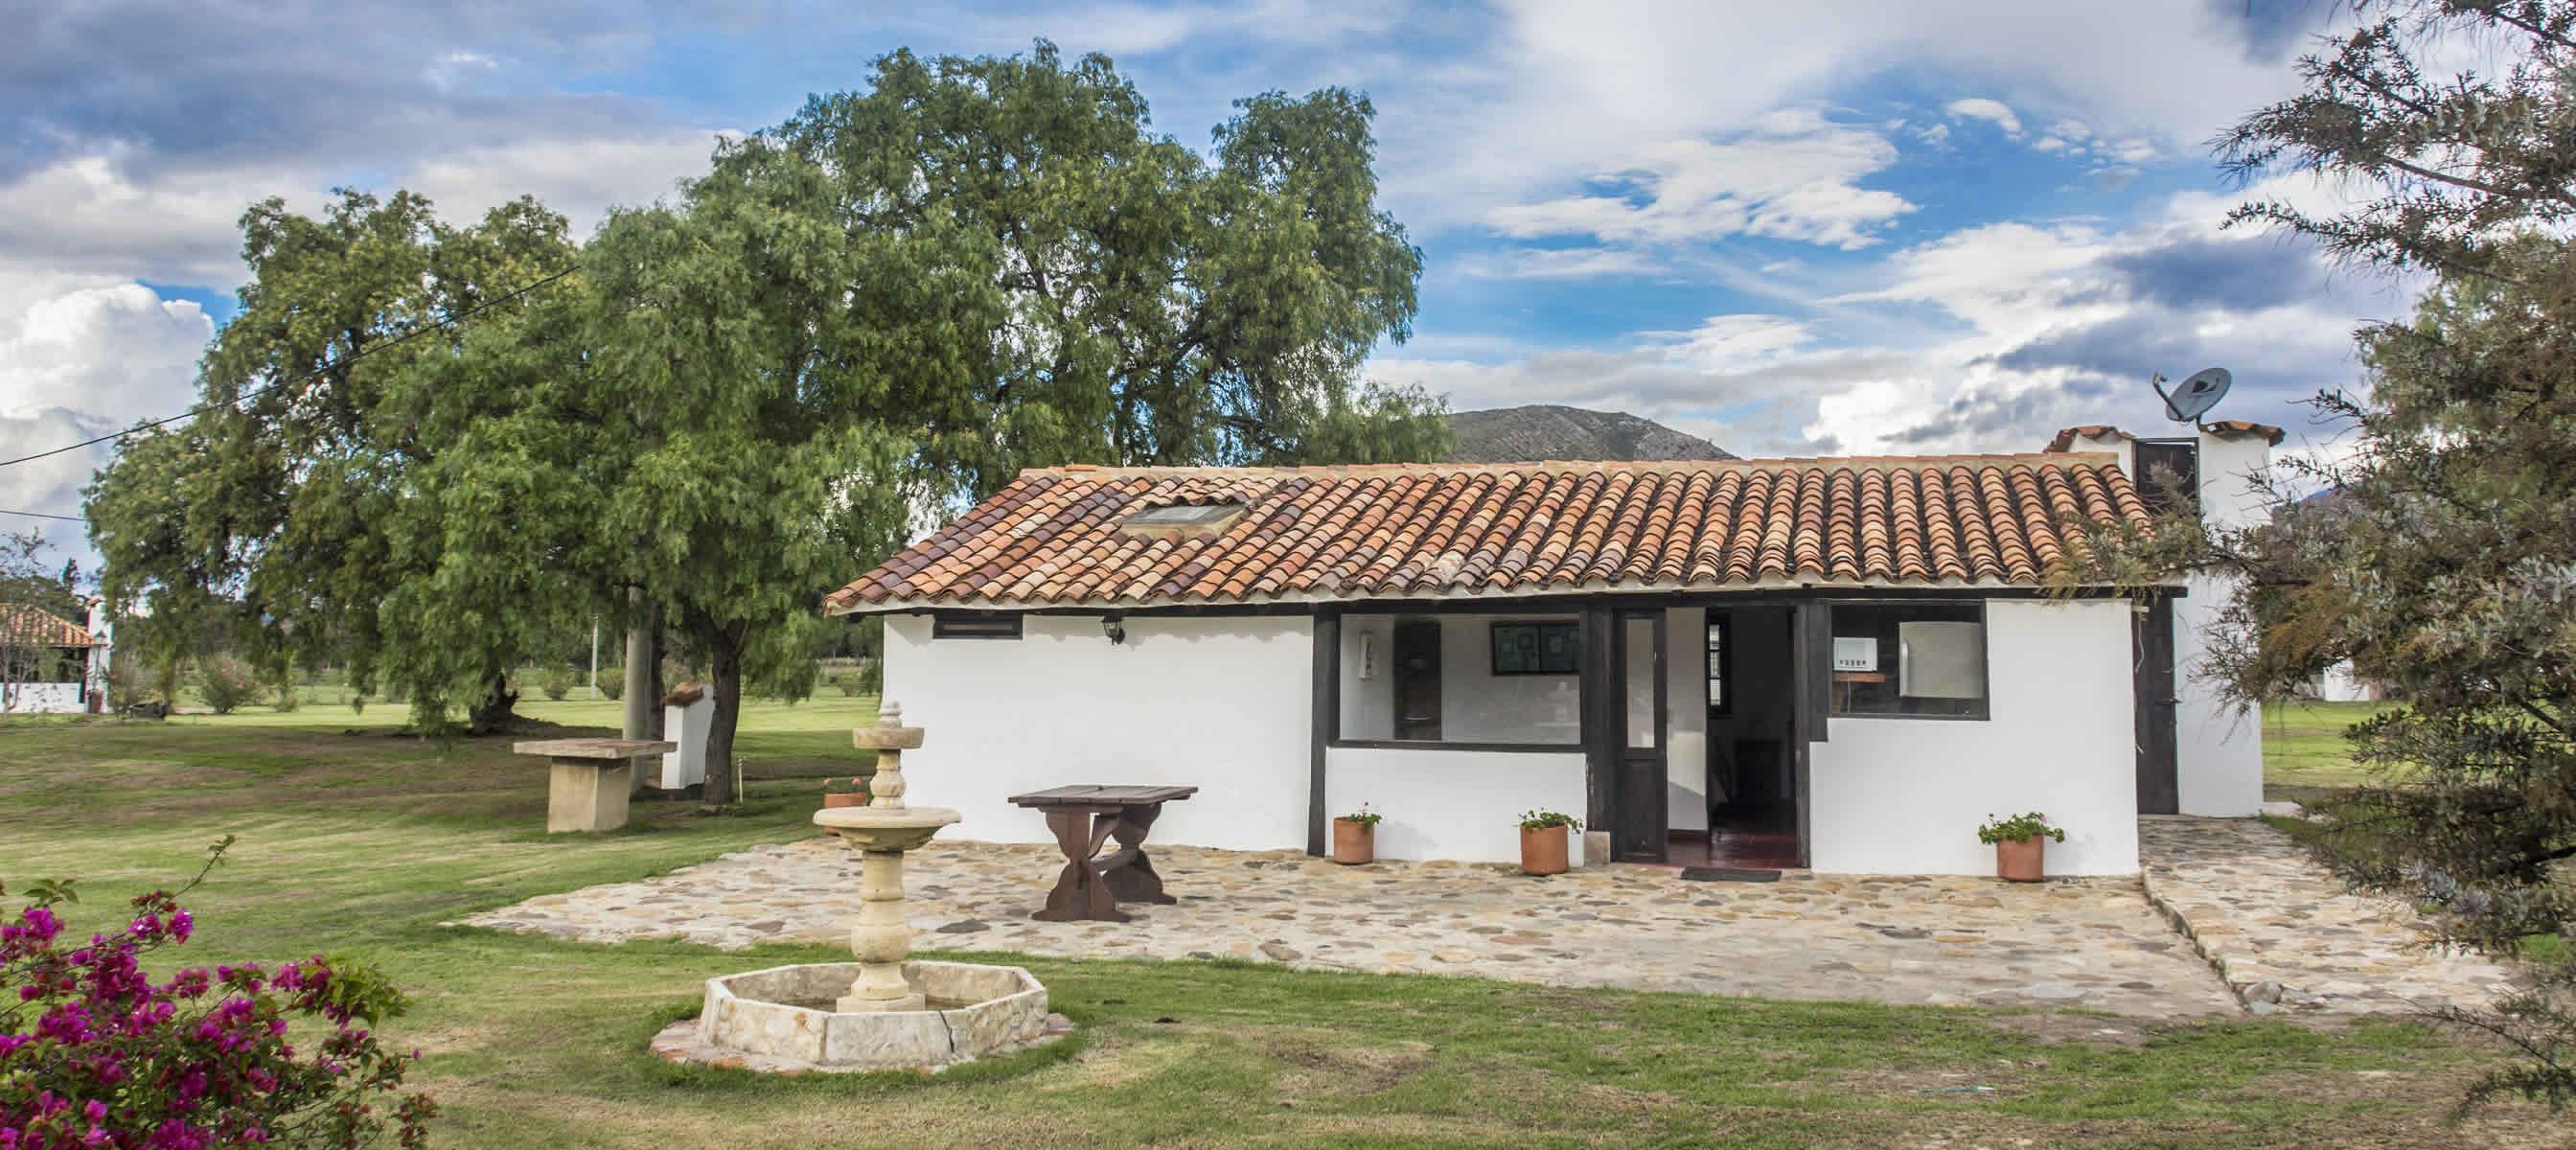 Veracruz – Casa de Verano casa para para alquiler en Villa de Leyva